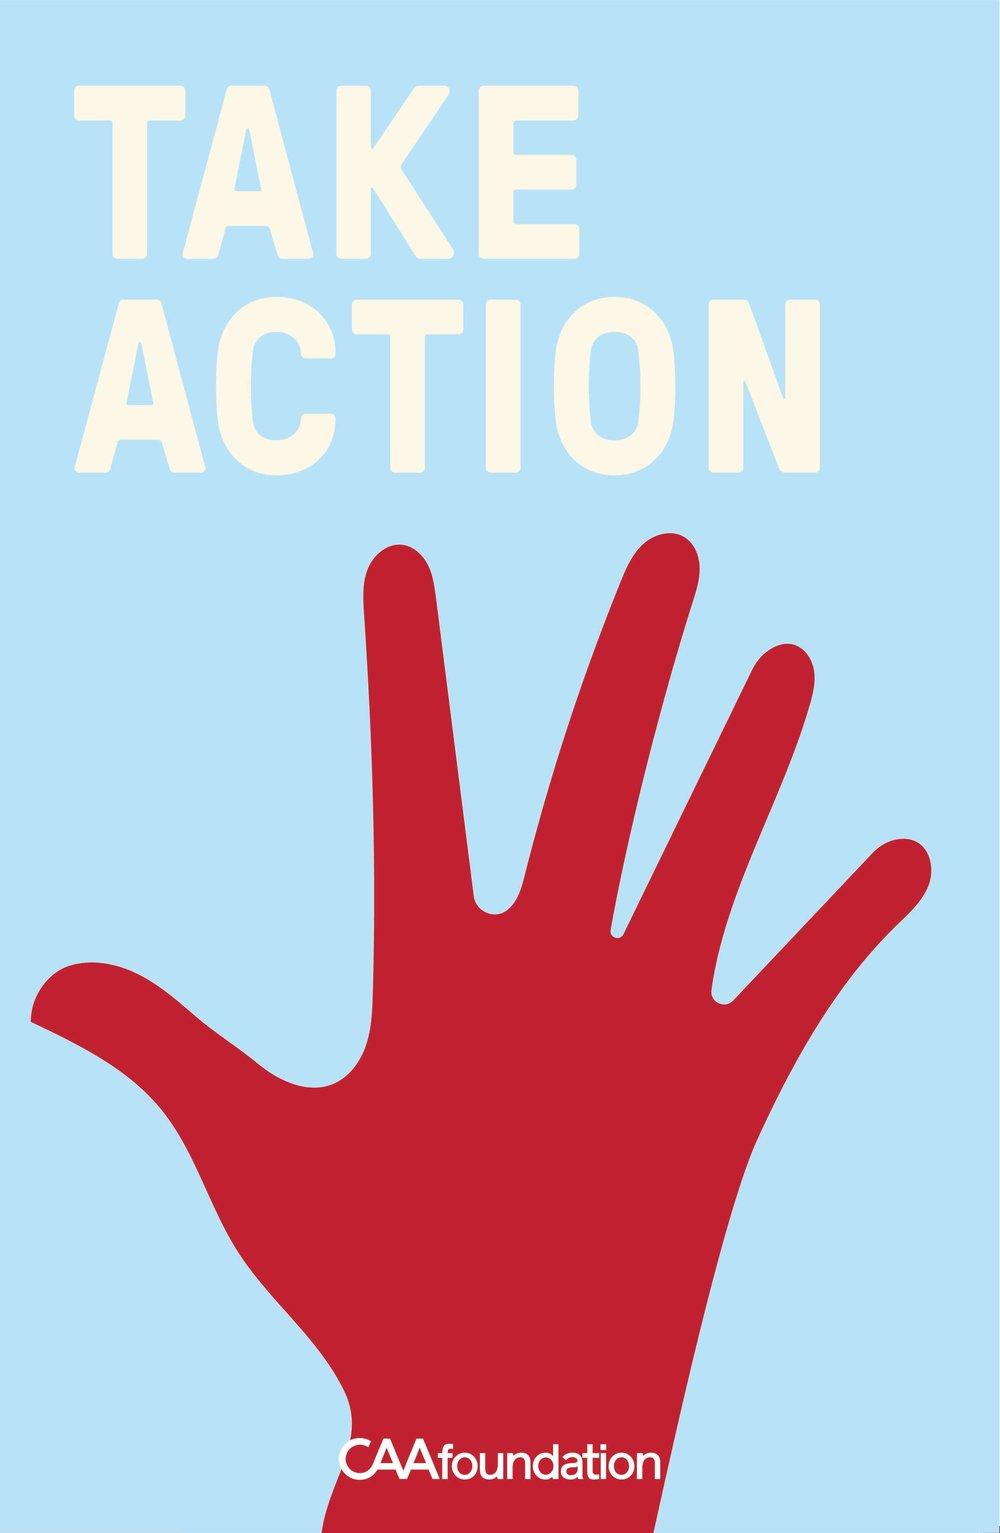 Take_Action_Posters_v5-02.jpg